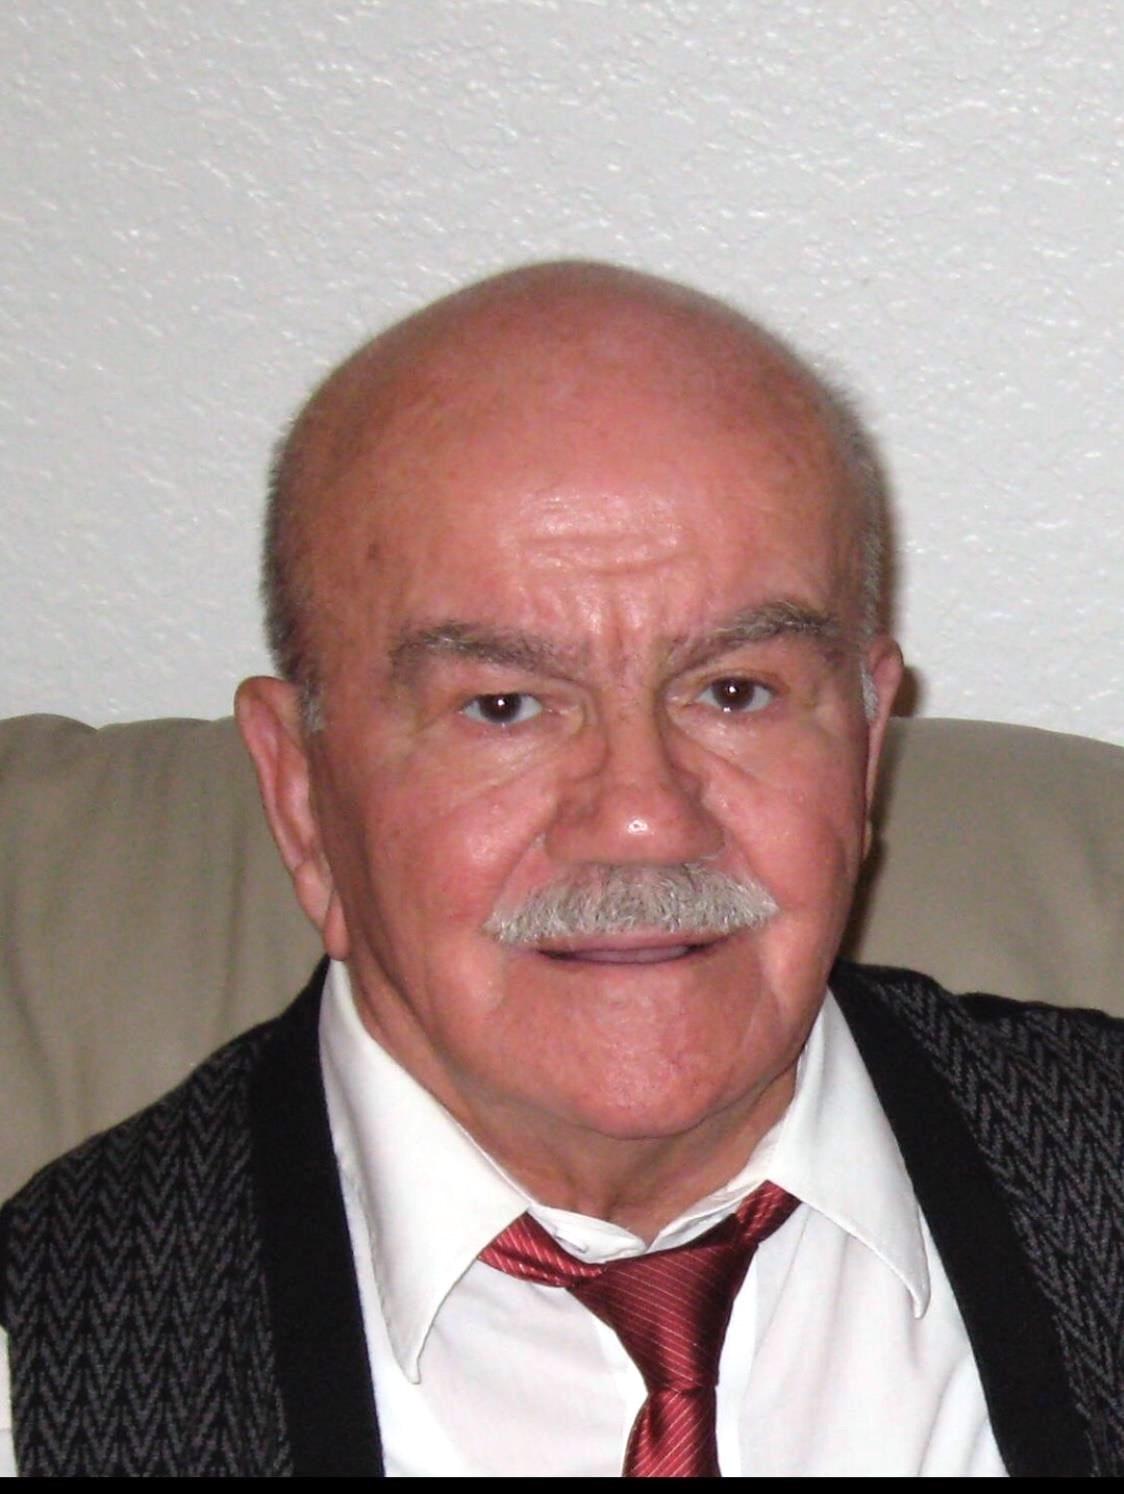 Philip Sarkis  Demerjian